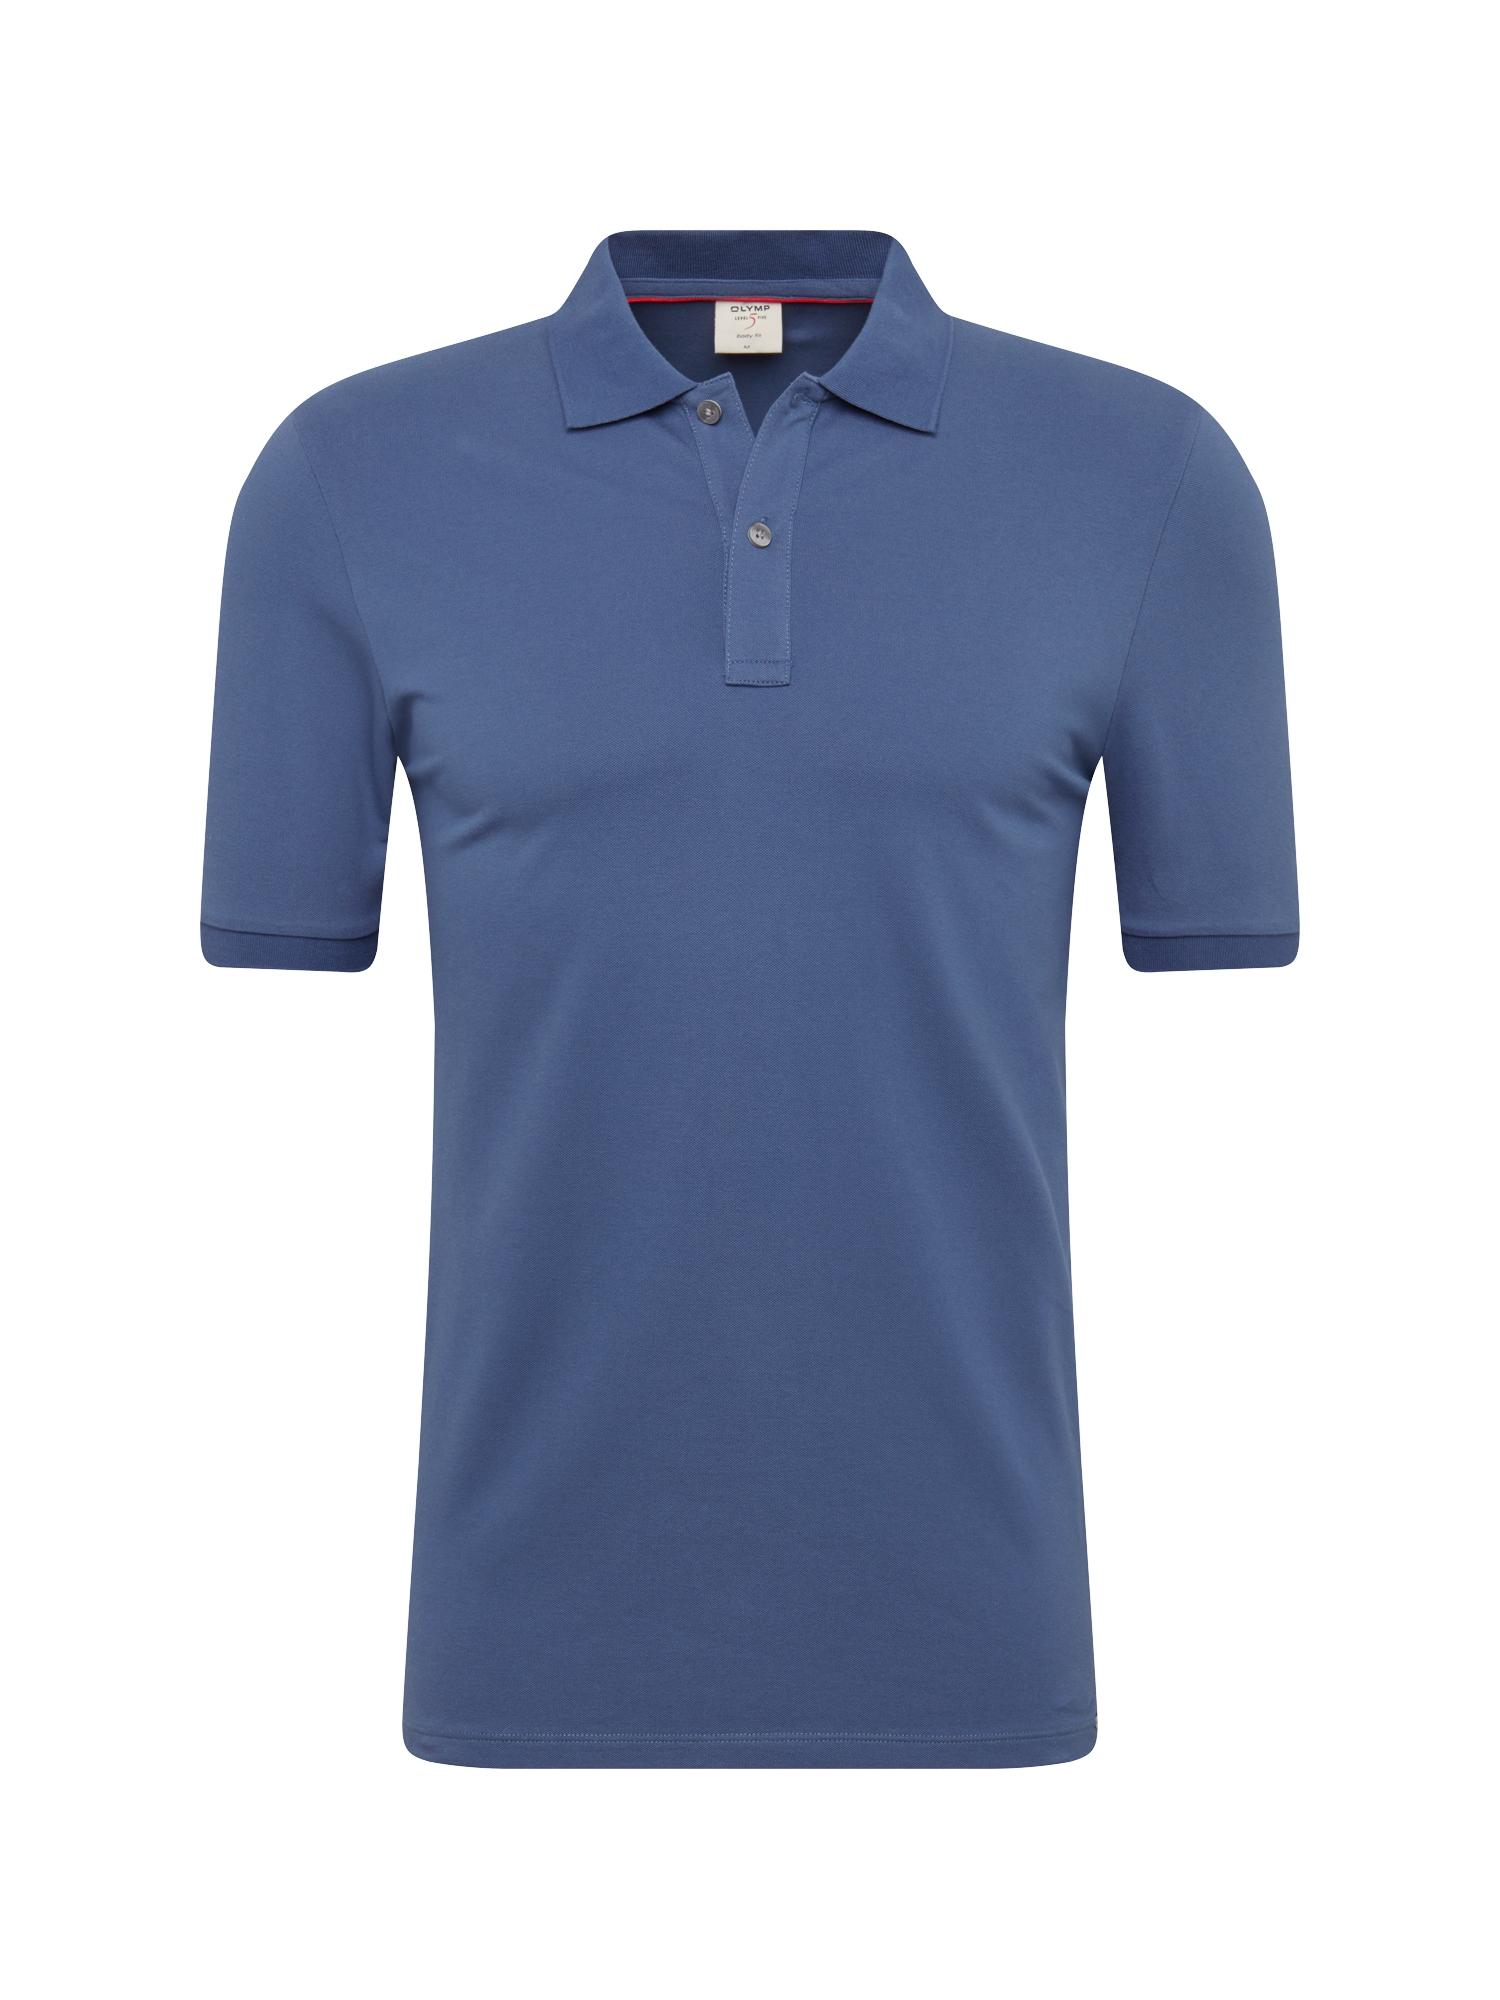 Tričko Level 5 Casual Polo Cotton indigo OLYMP